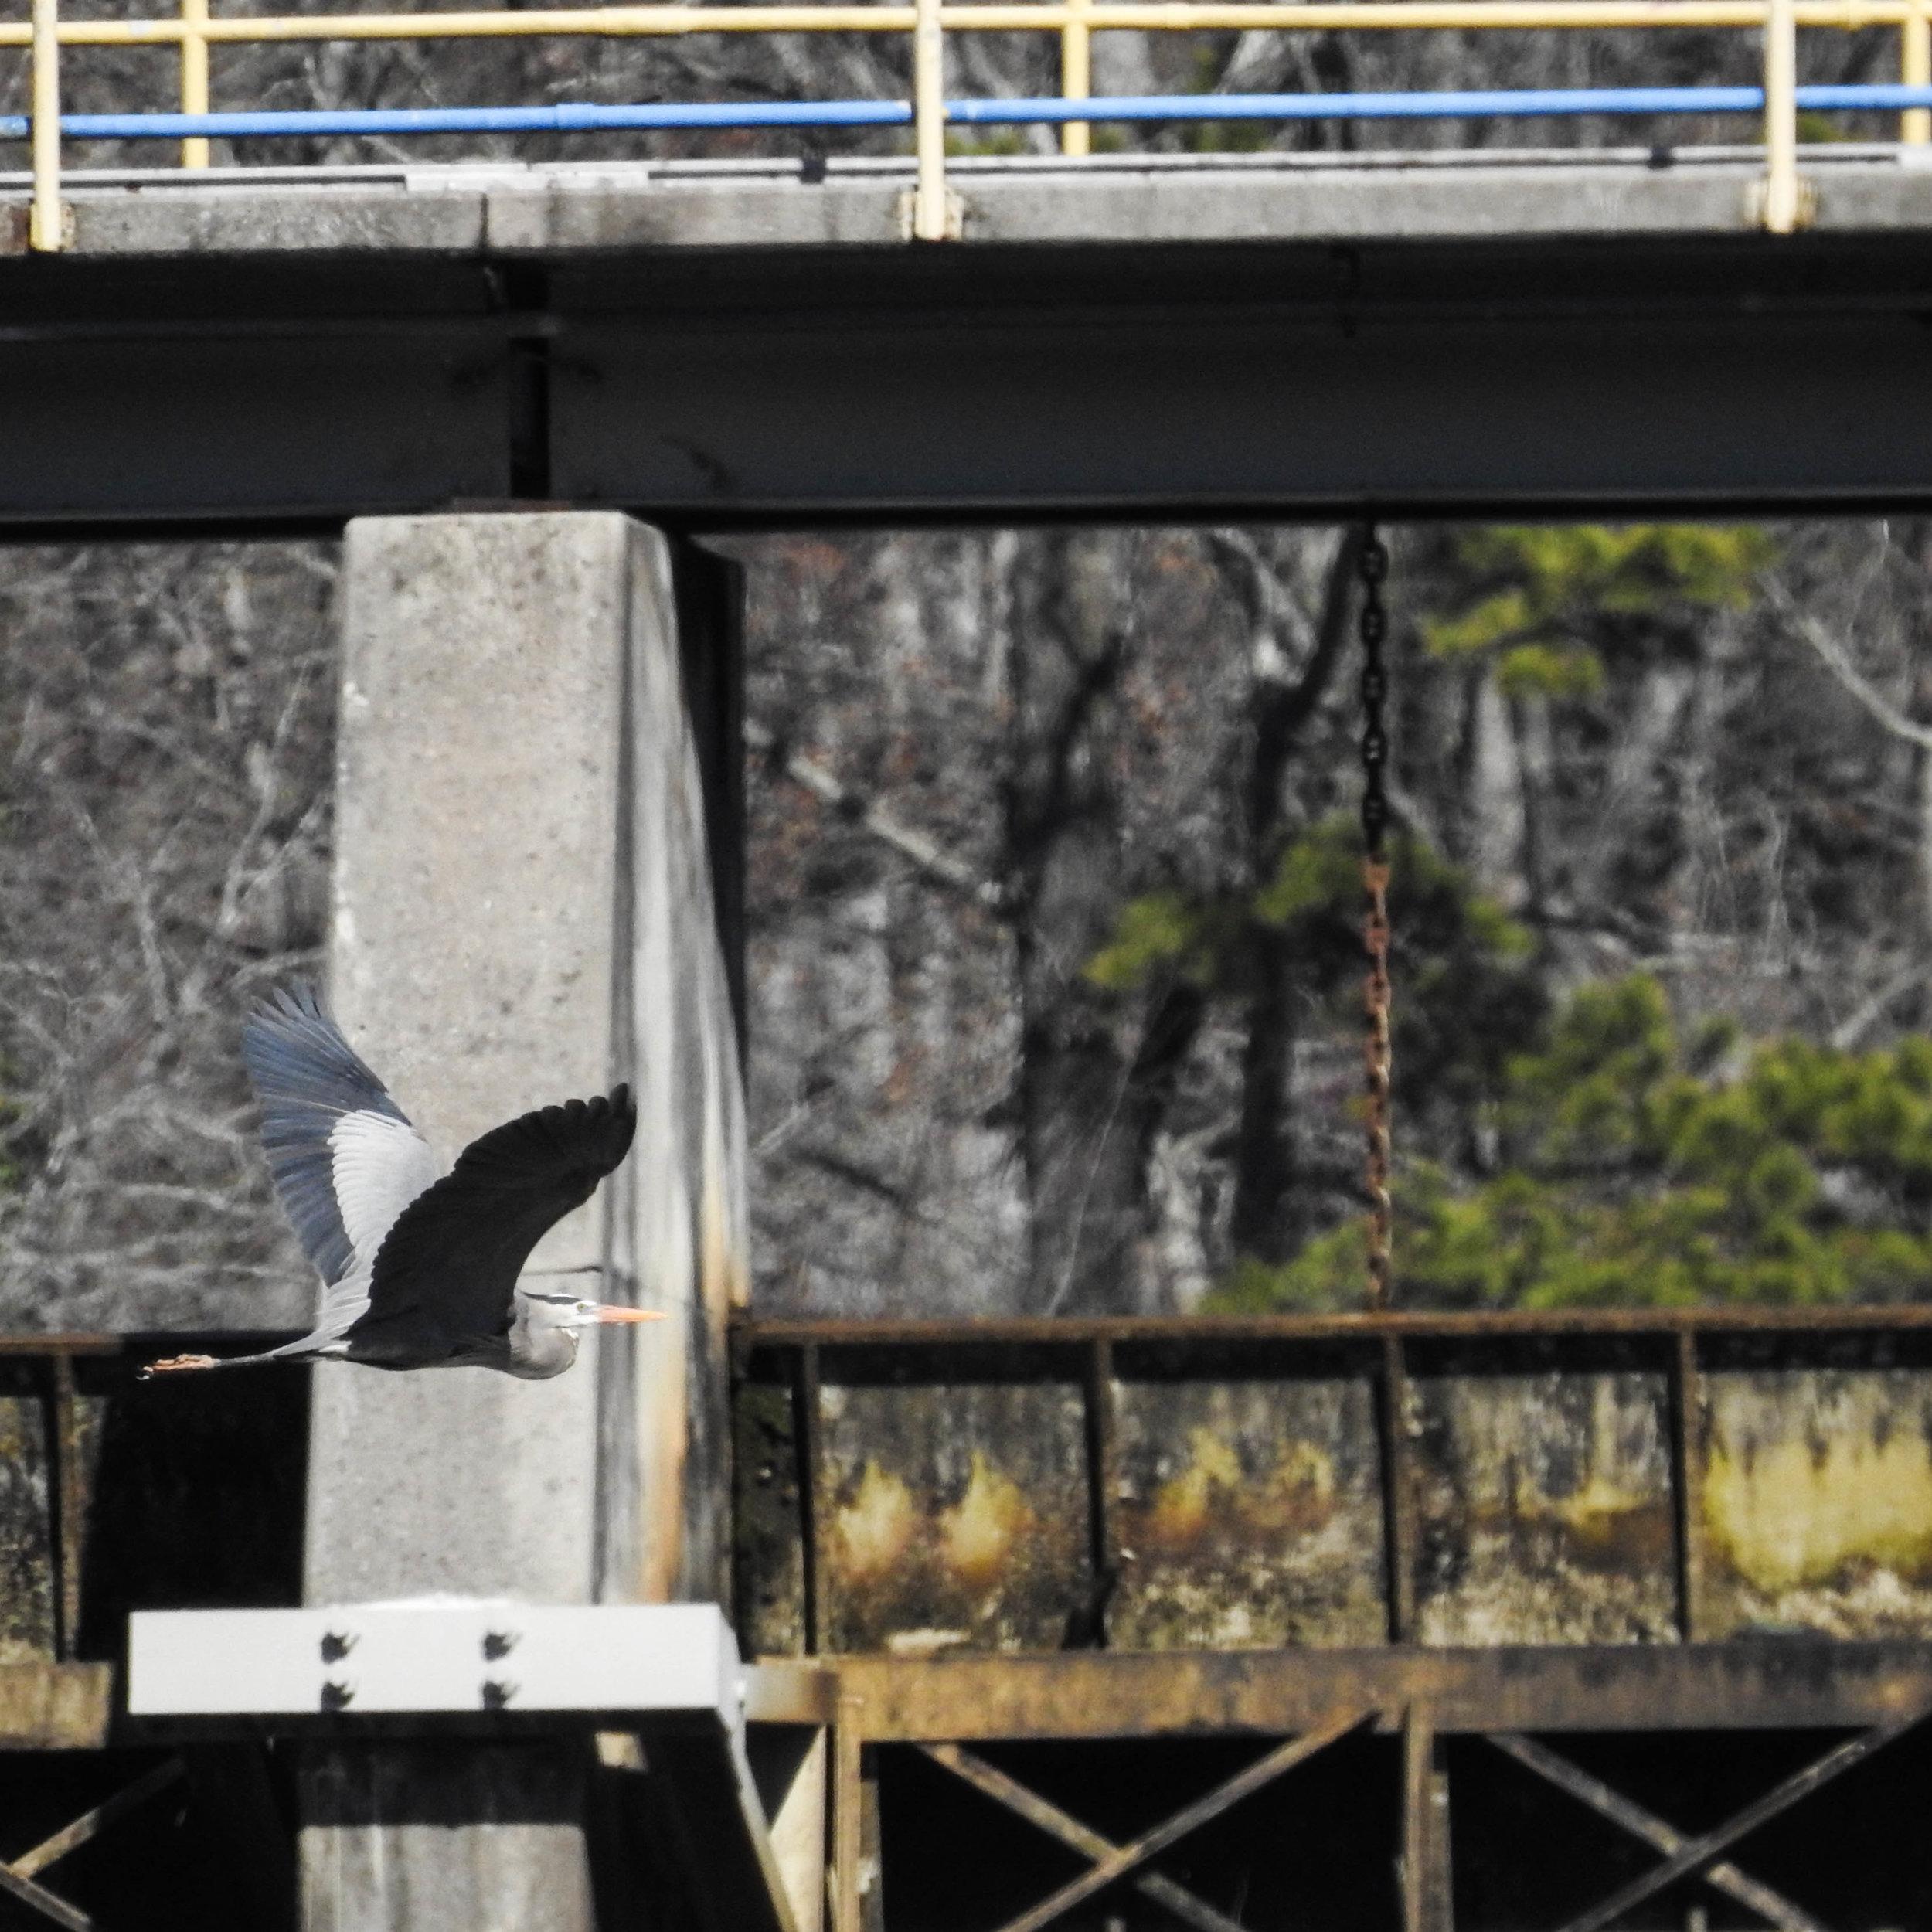 Great Blue Heron at Morgan Falls Dam, River Park, March 4, 2017